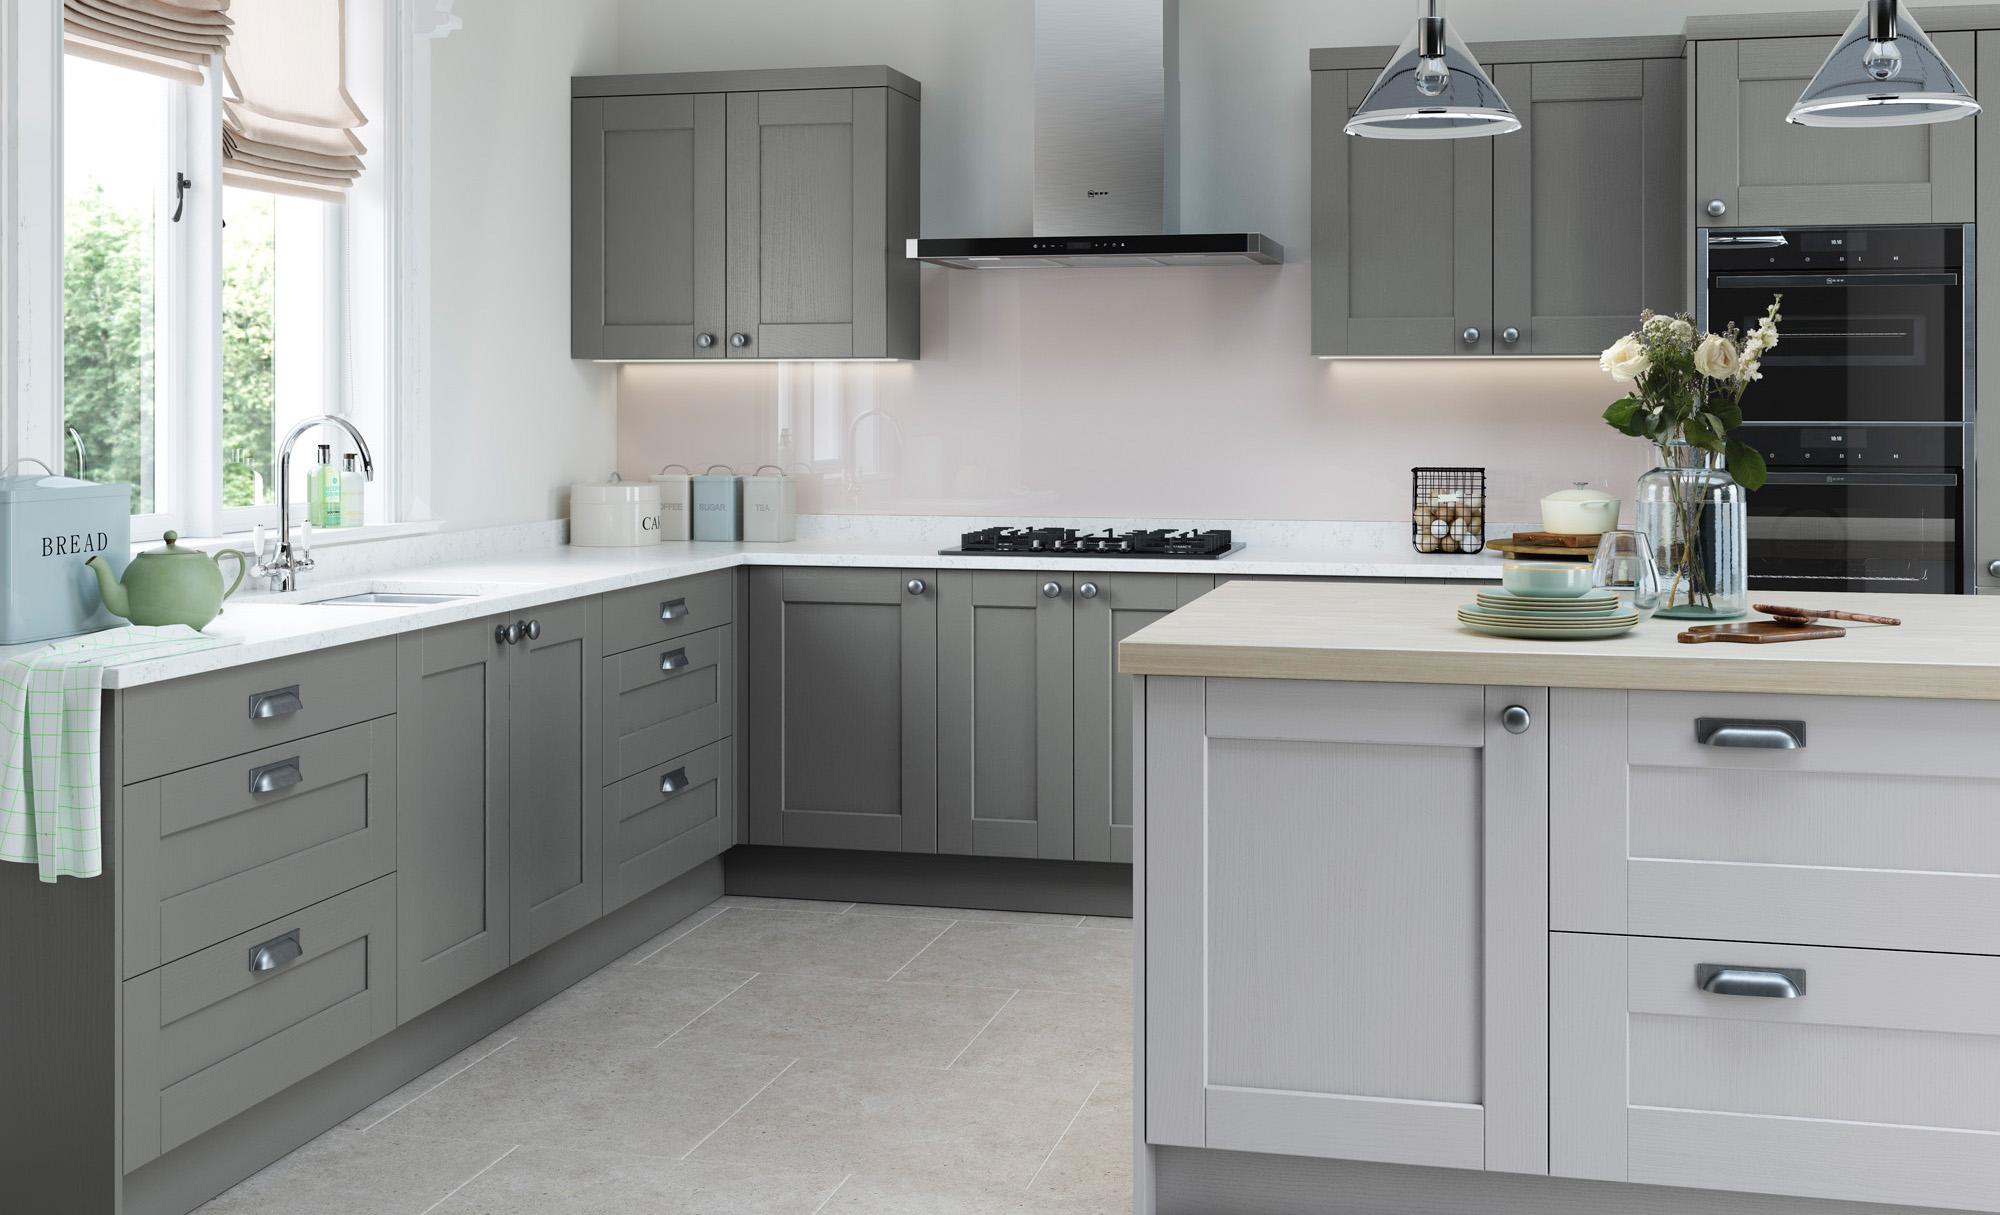 Classic Traditional Kitchen - Kensington Light Grey and Dust Grey Kitchen - Kitchen Design - Alan Kelly Kitchens - Waterford